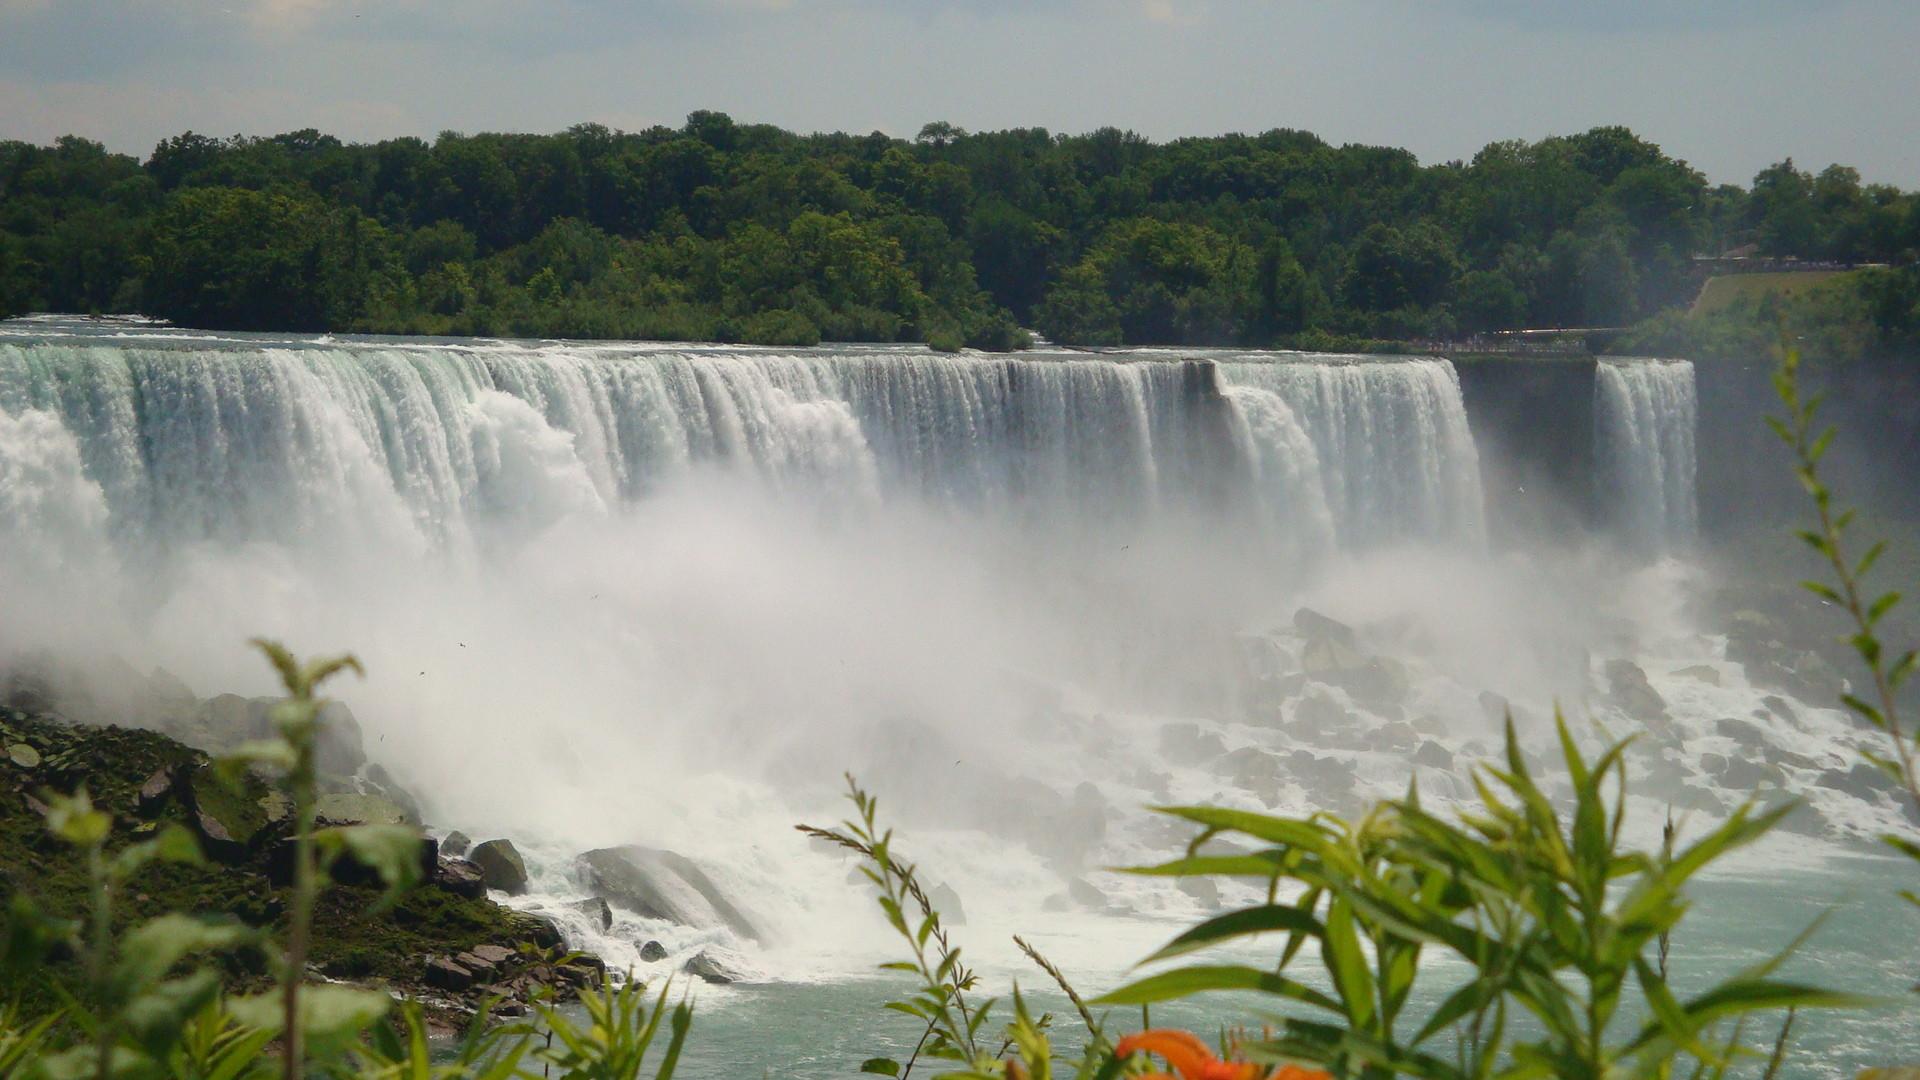 Niagara Falls Hd Wallpaper For Desktop Niagara Falls Background 183 ①